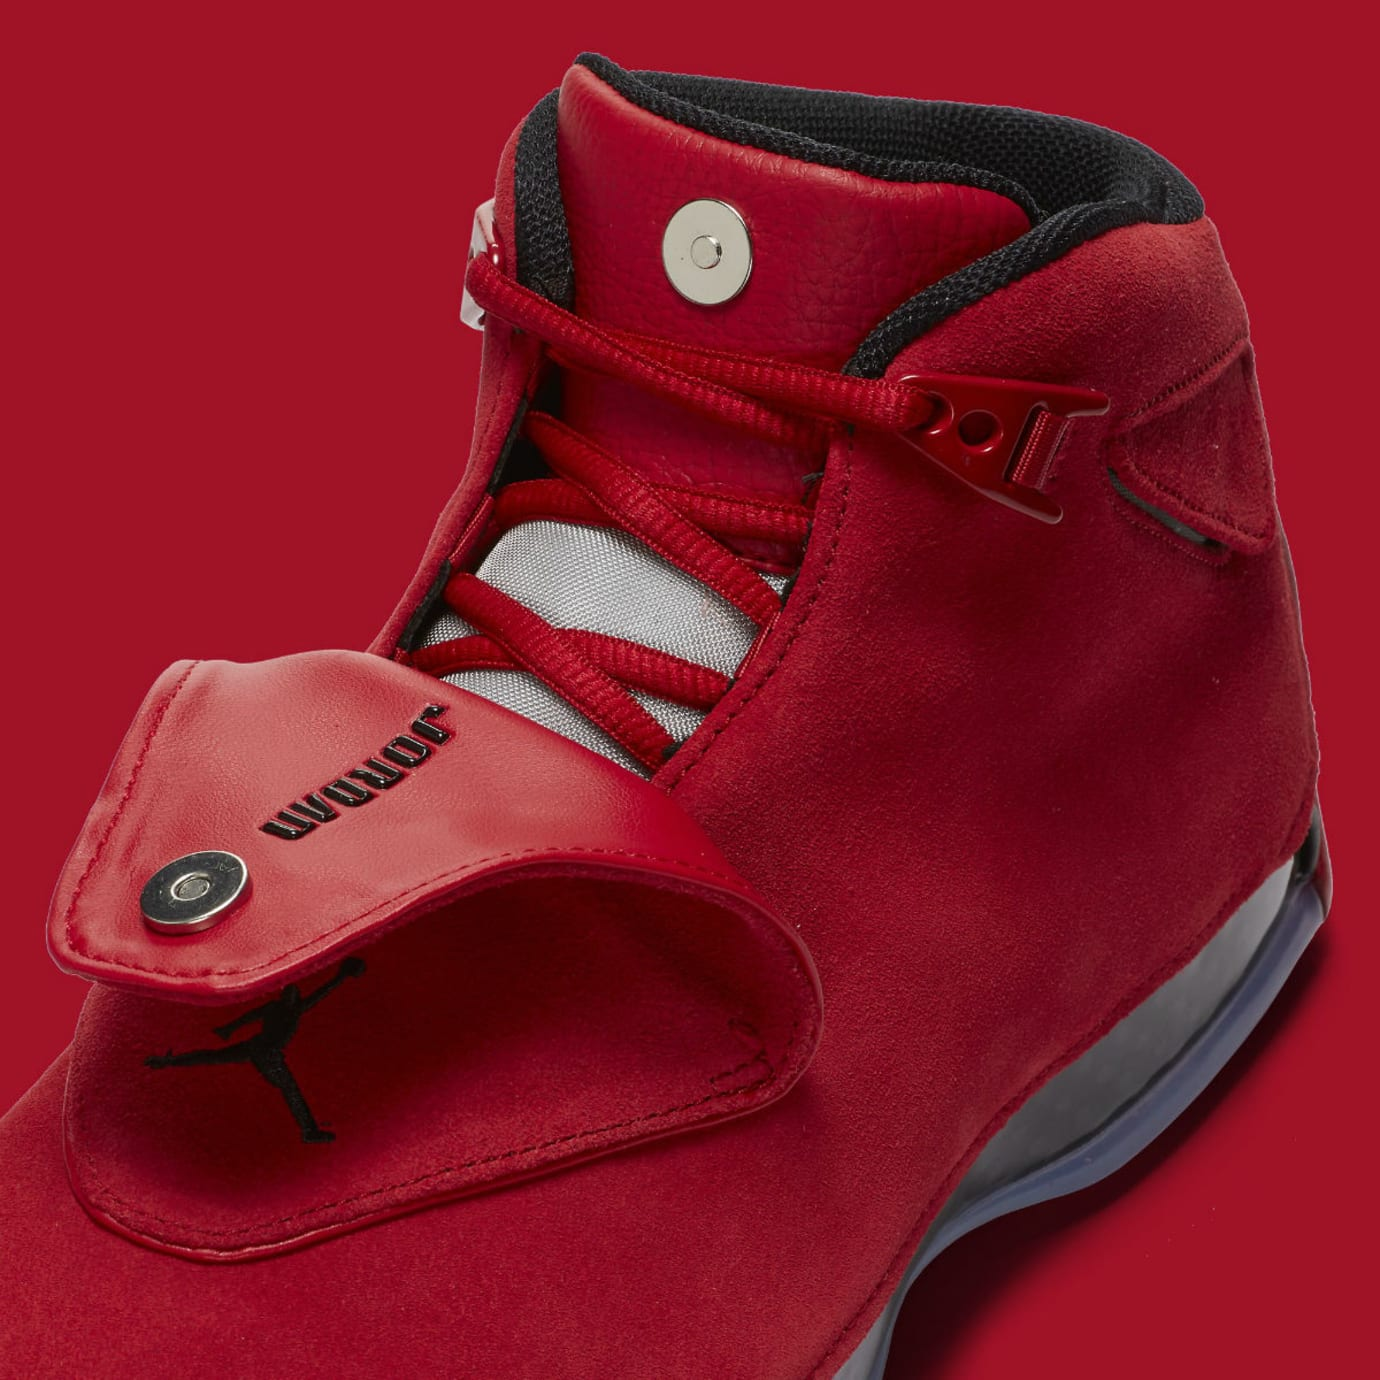 e9070251f50e Air Jordan 18 XVIII Toro Gym Red Release Date AA2494-601 Shroud